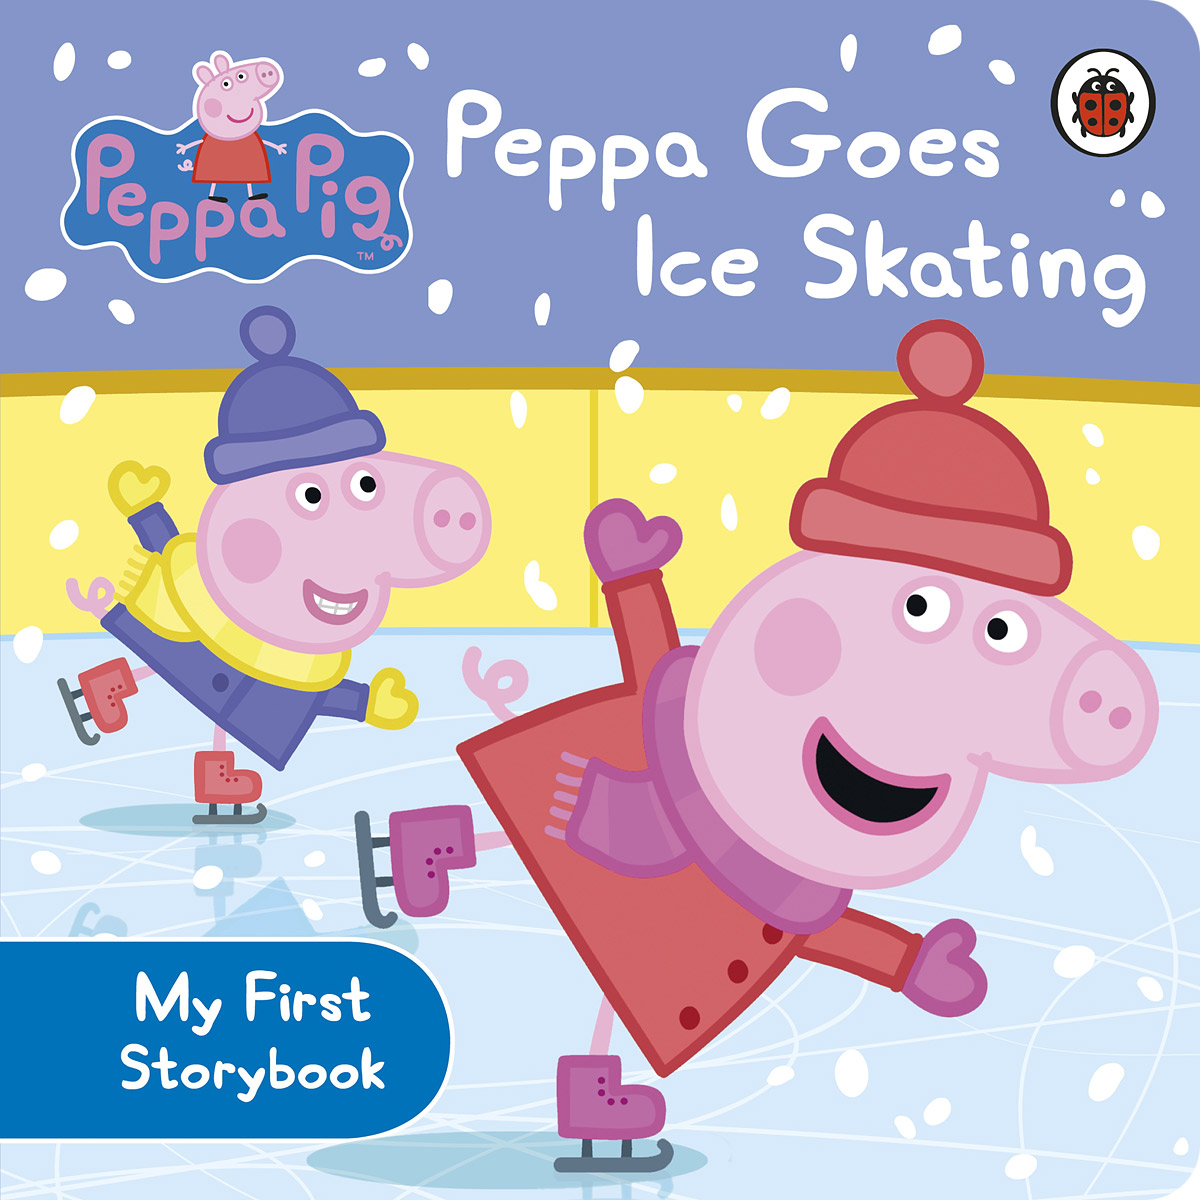 Peppa Pig: Peppa Goes Ice Skating peppa pig транспорт 01565